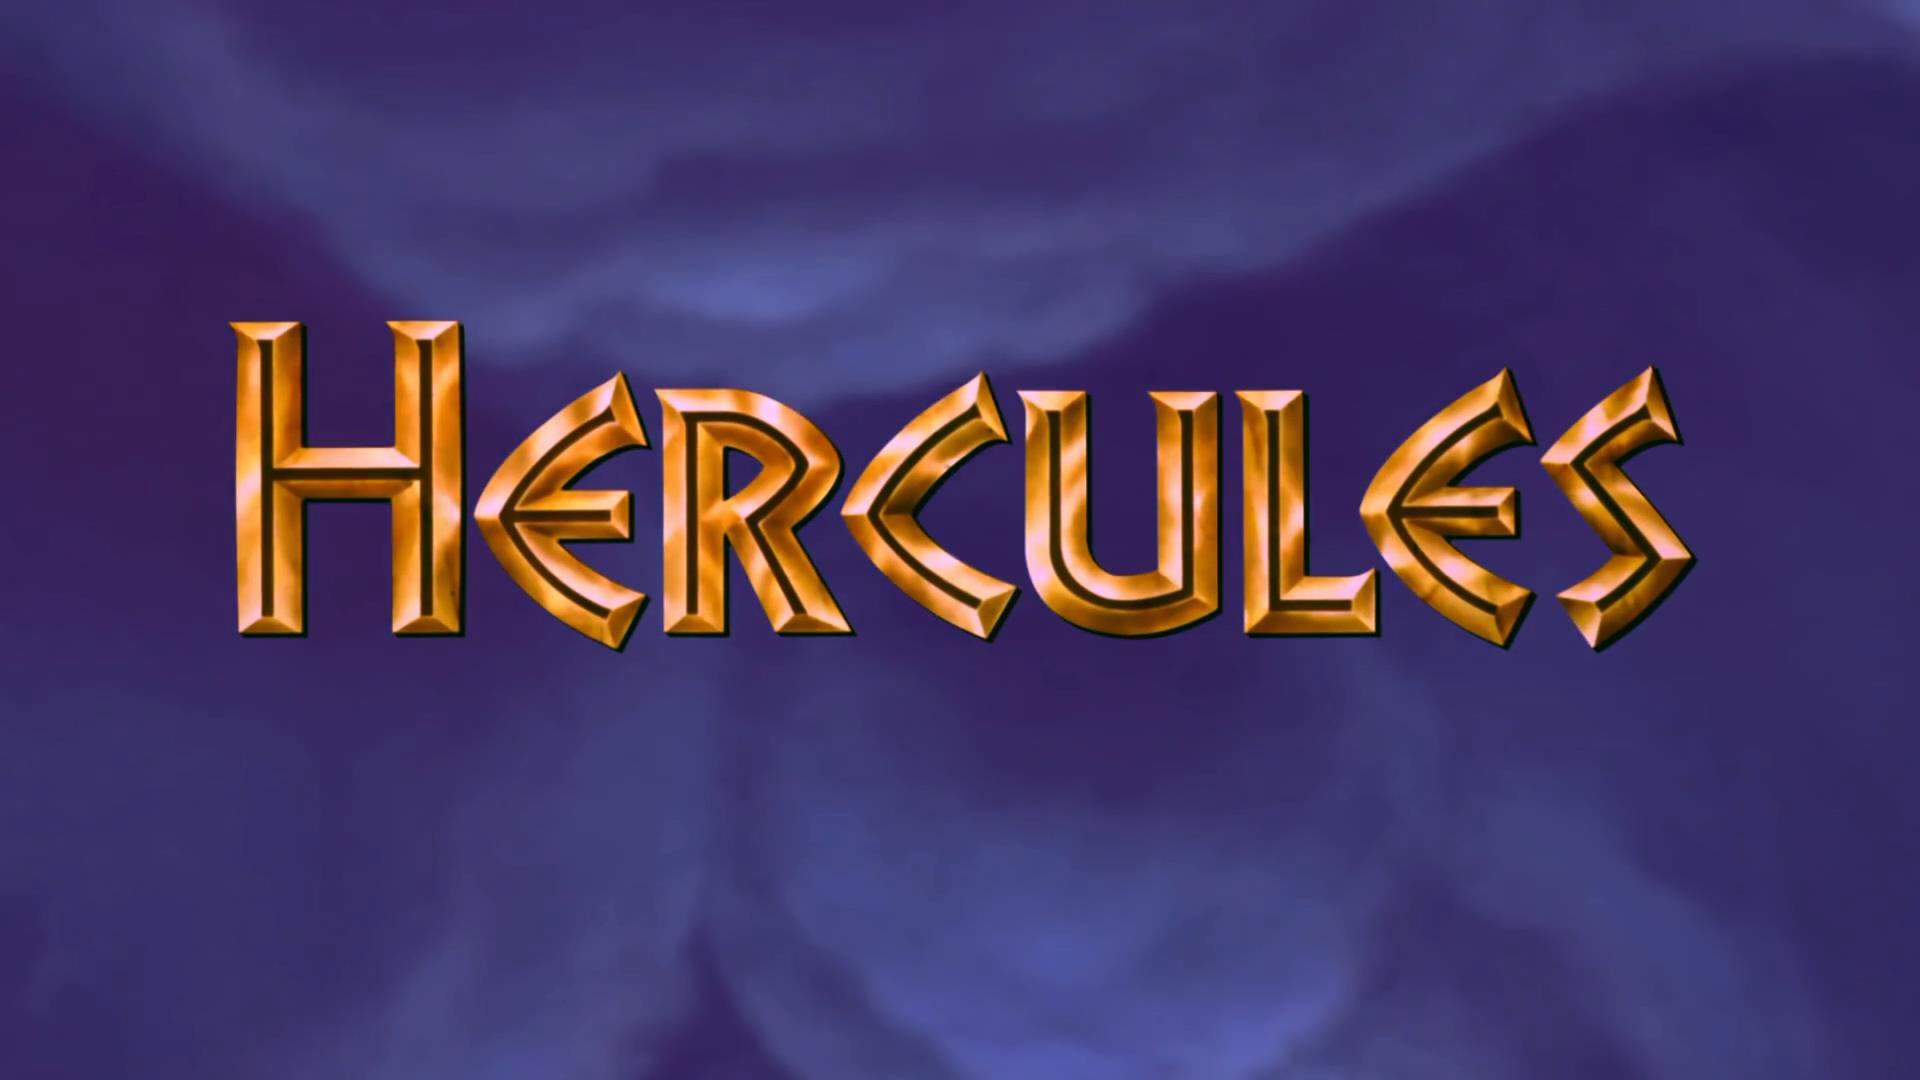 Hércules (filme)/Galeria